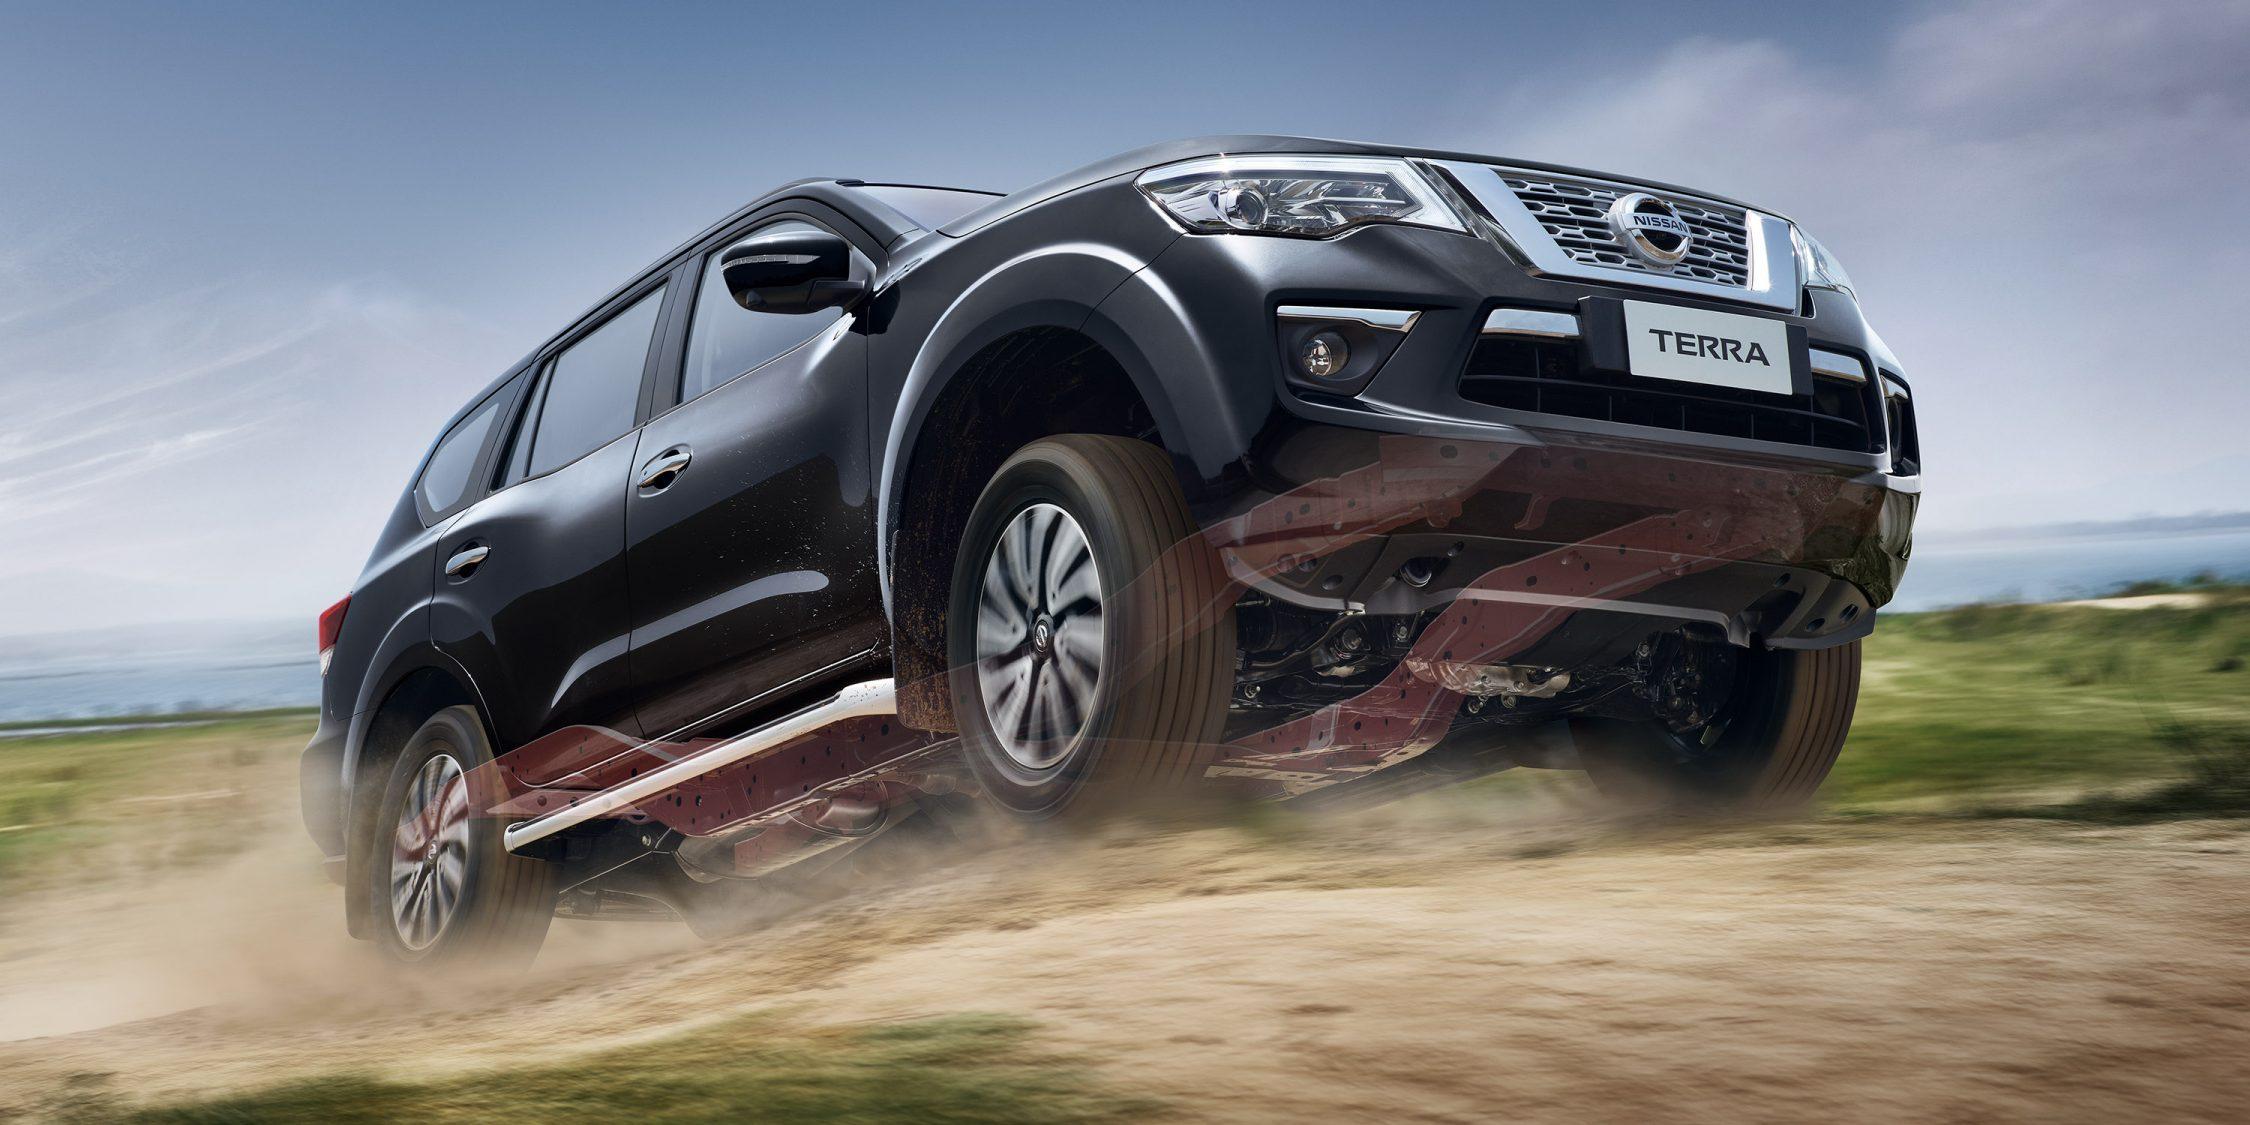 Nissan Terra driving up a rough dirt road